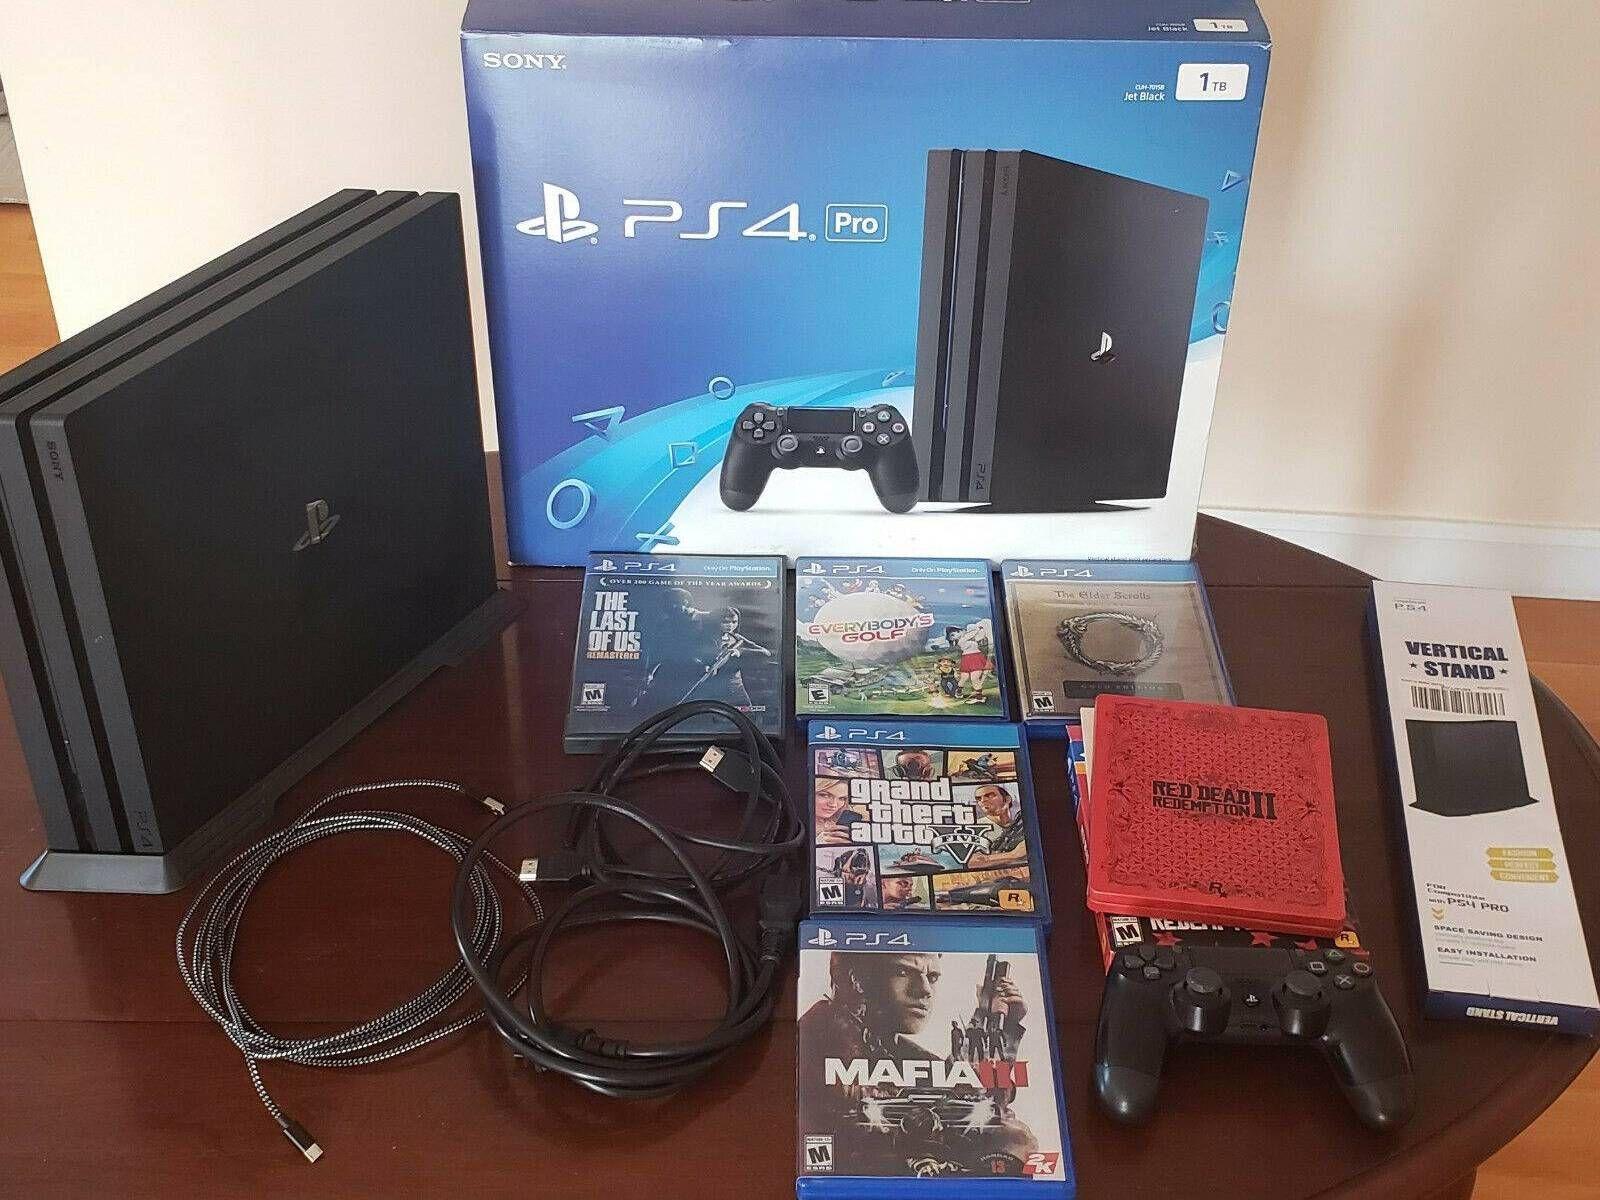 Playstation 4 Ps4 Pro 1tb Black 6 Games Bundle Gta 5 Red Dead 2 Etc In 2020 Game Bundle Playstation 4 Ps4 Pro